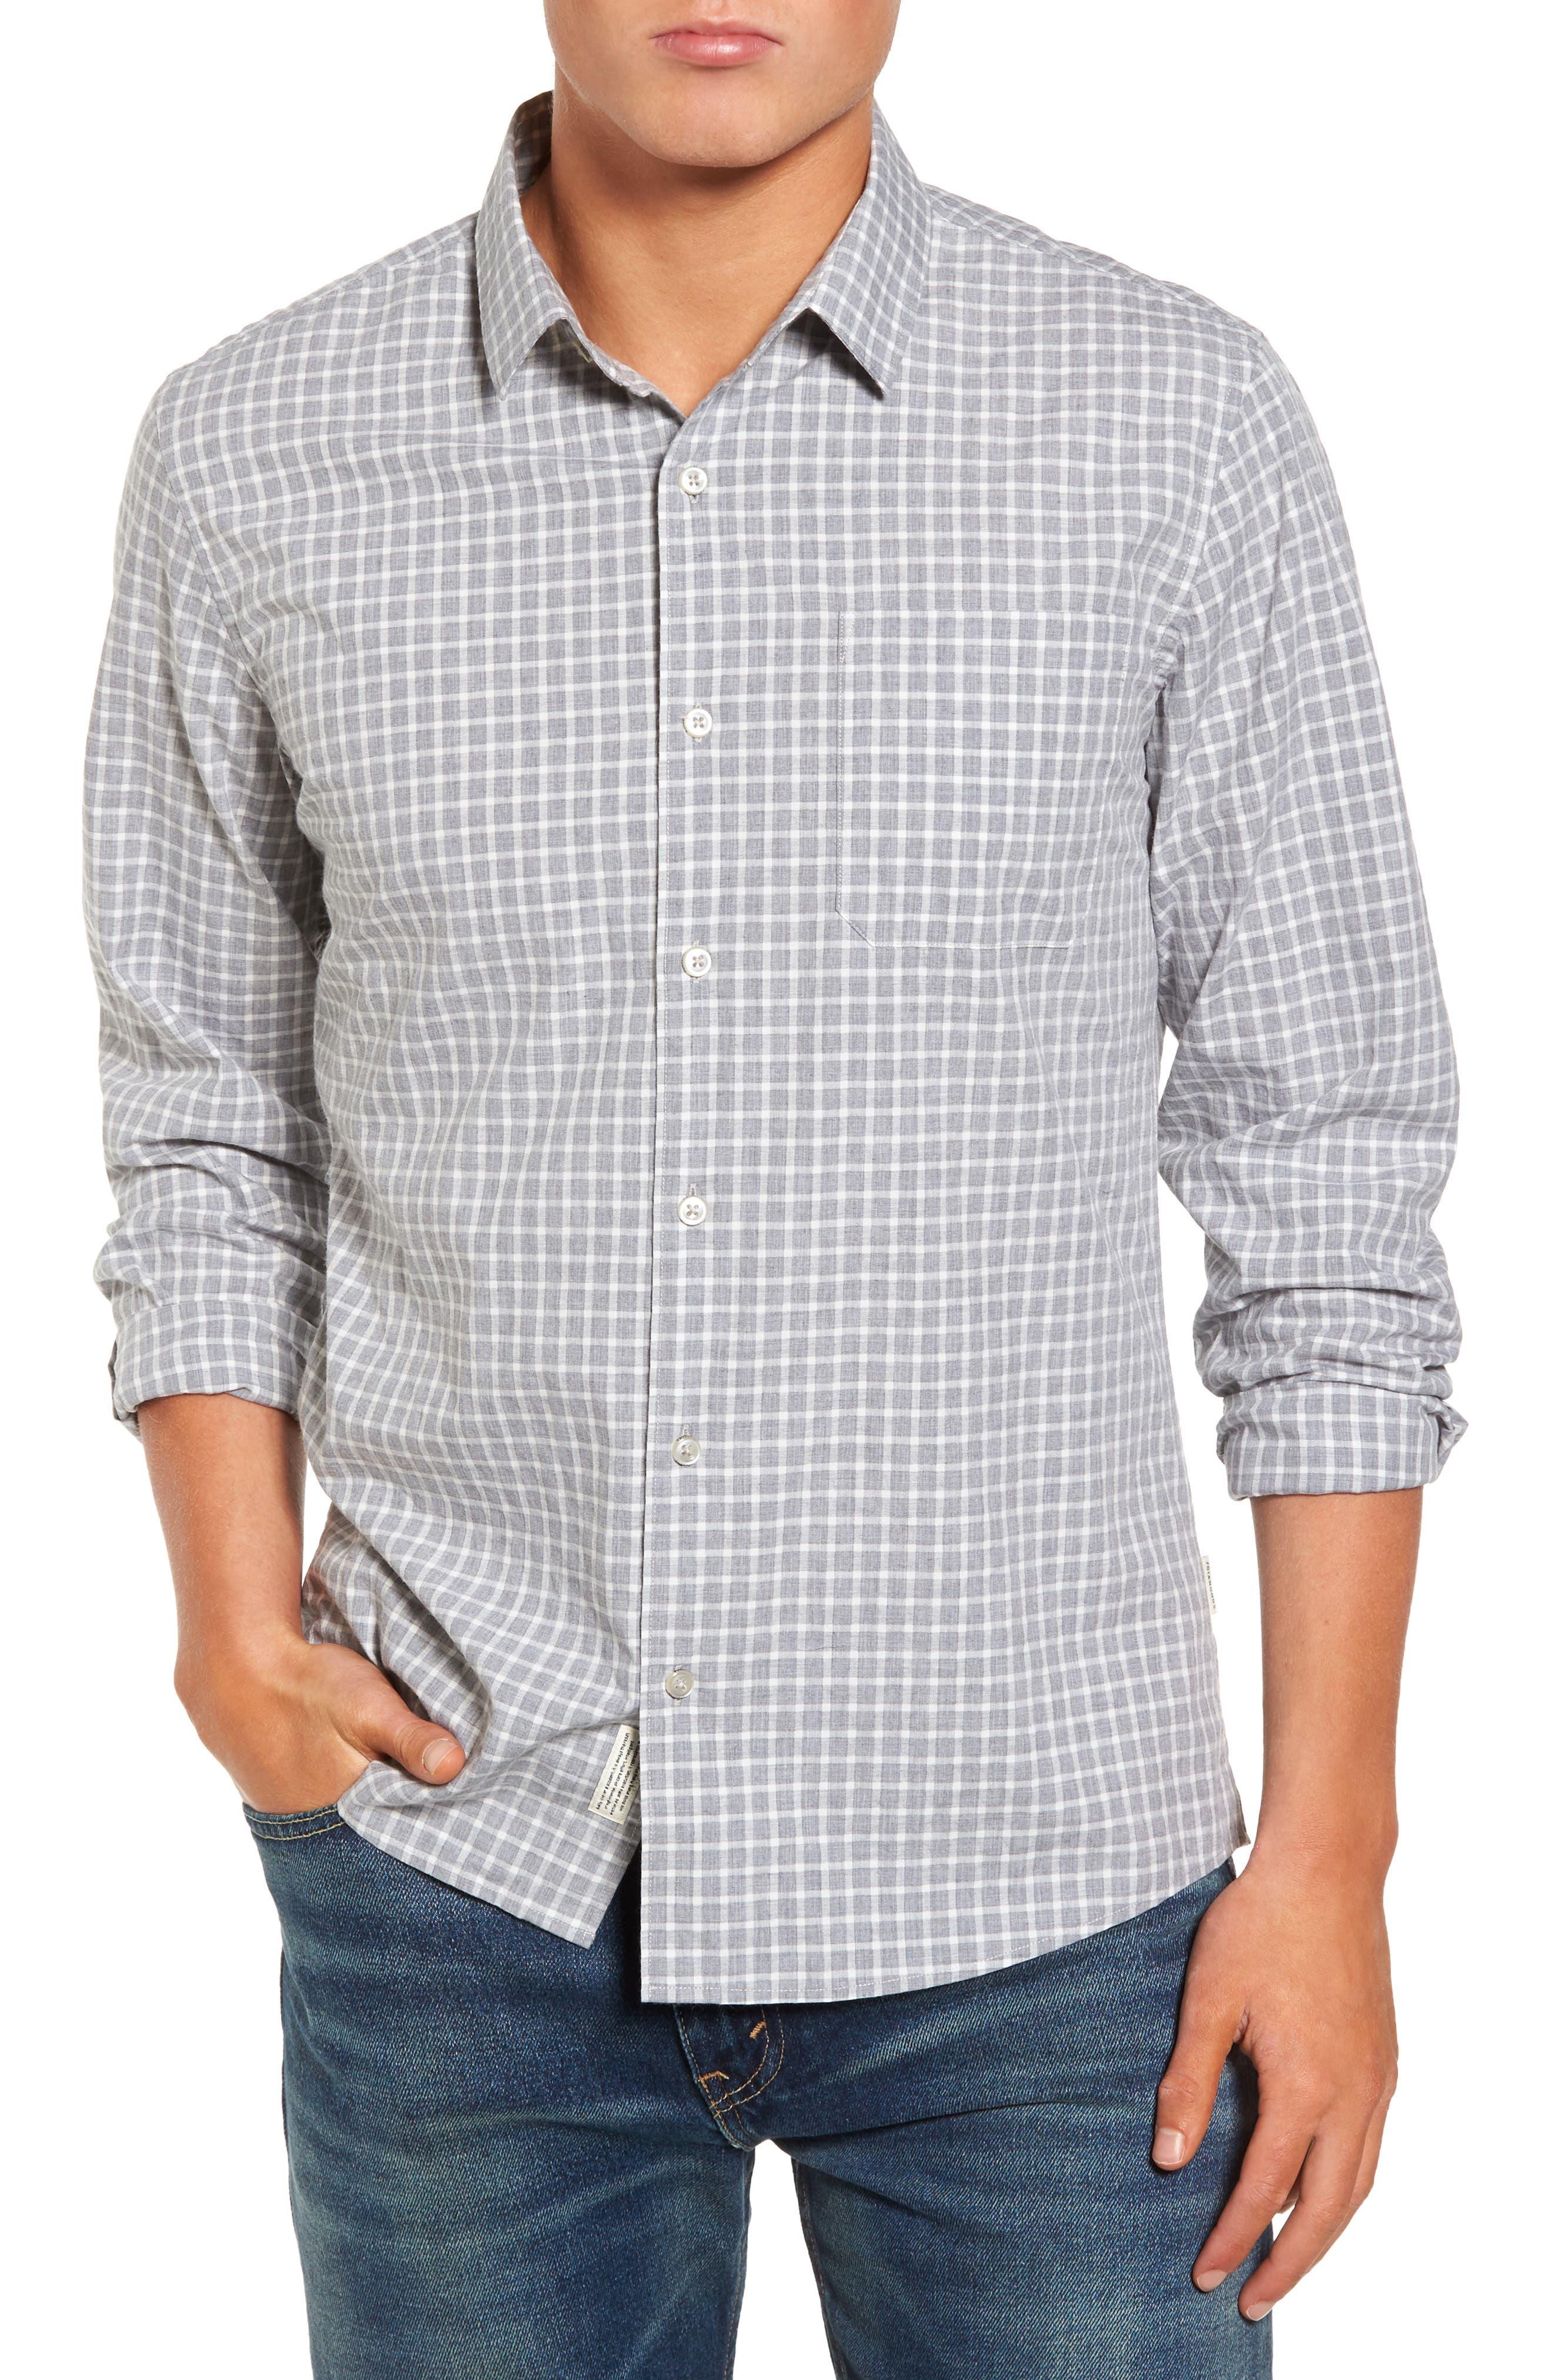 Illusions Woven Shirt,                         Main,                         color, Lt. Grey